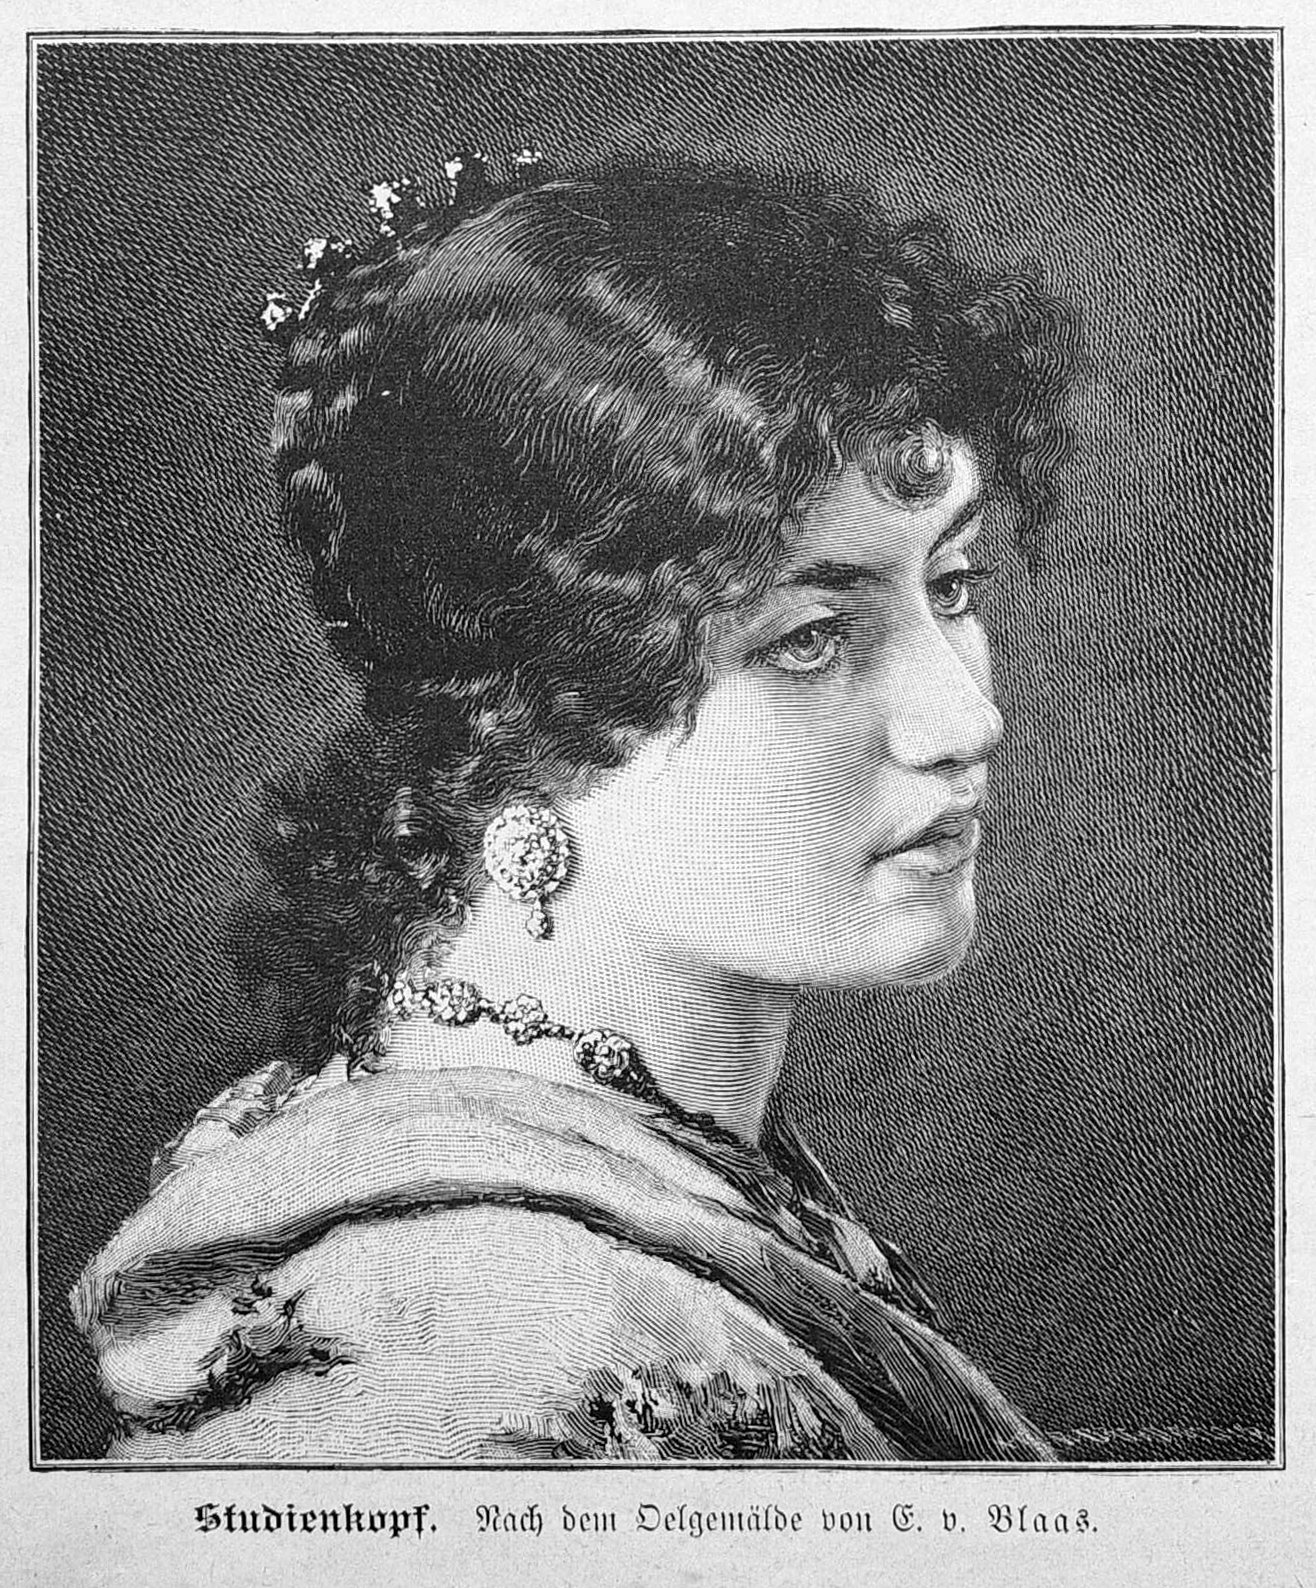 Die_Gartenlaube_(1887)_b_069